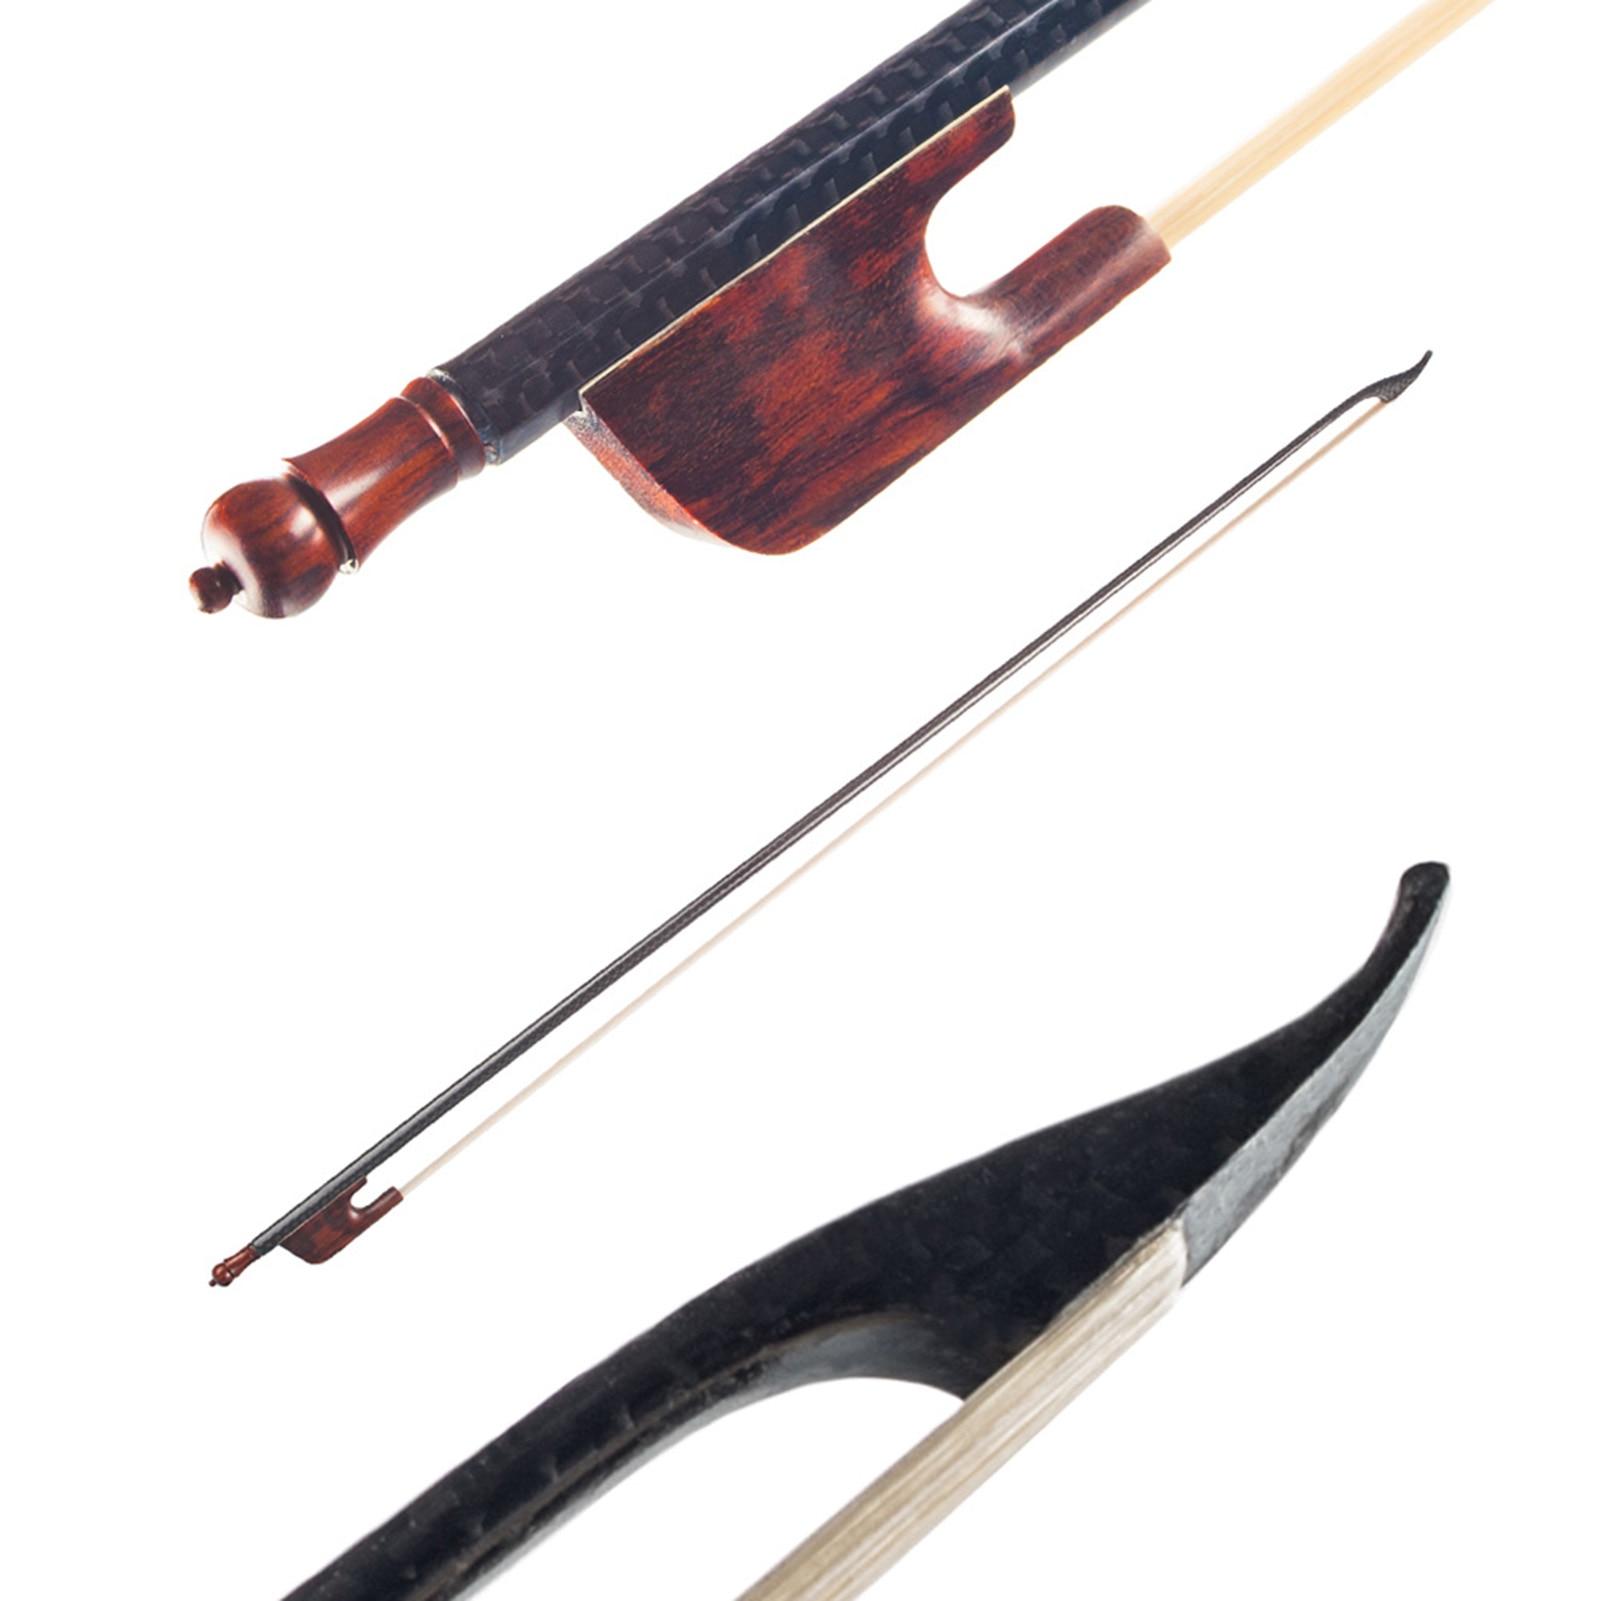 4/4 Violin Fiddle Bow Baroque Style Carbon Fiber Veneer Round Stick Ebony White Horsehair Well Balanced Violin Part